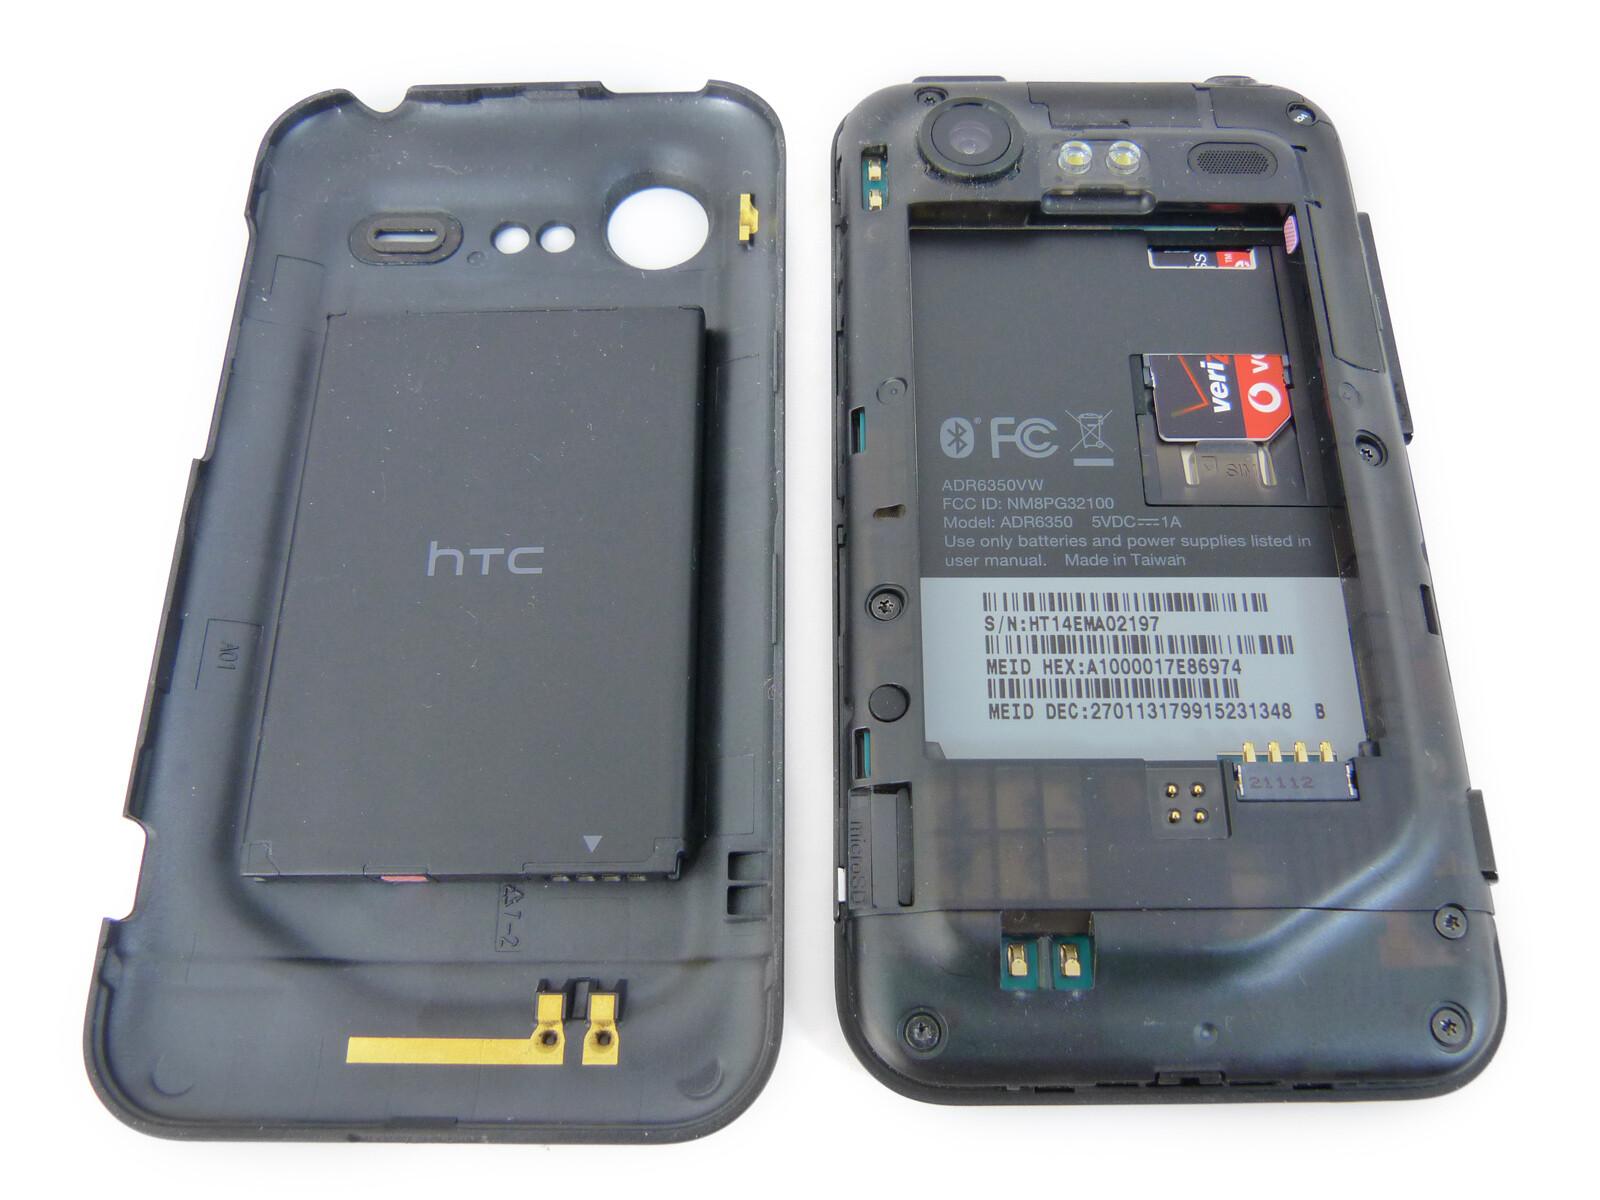 htc droid incredible 2 photos rh phonearena com Droid Incredible 2 Cell Phone Ballistic Phone Cases Droid Incredible